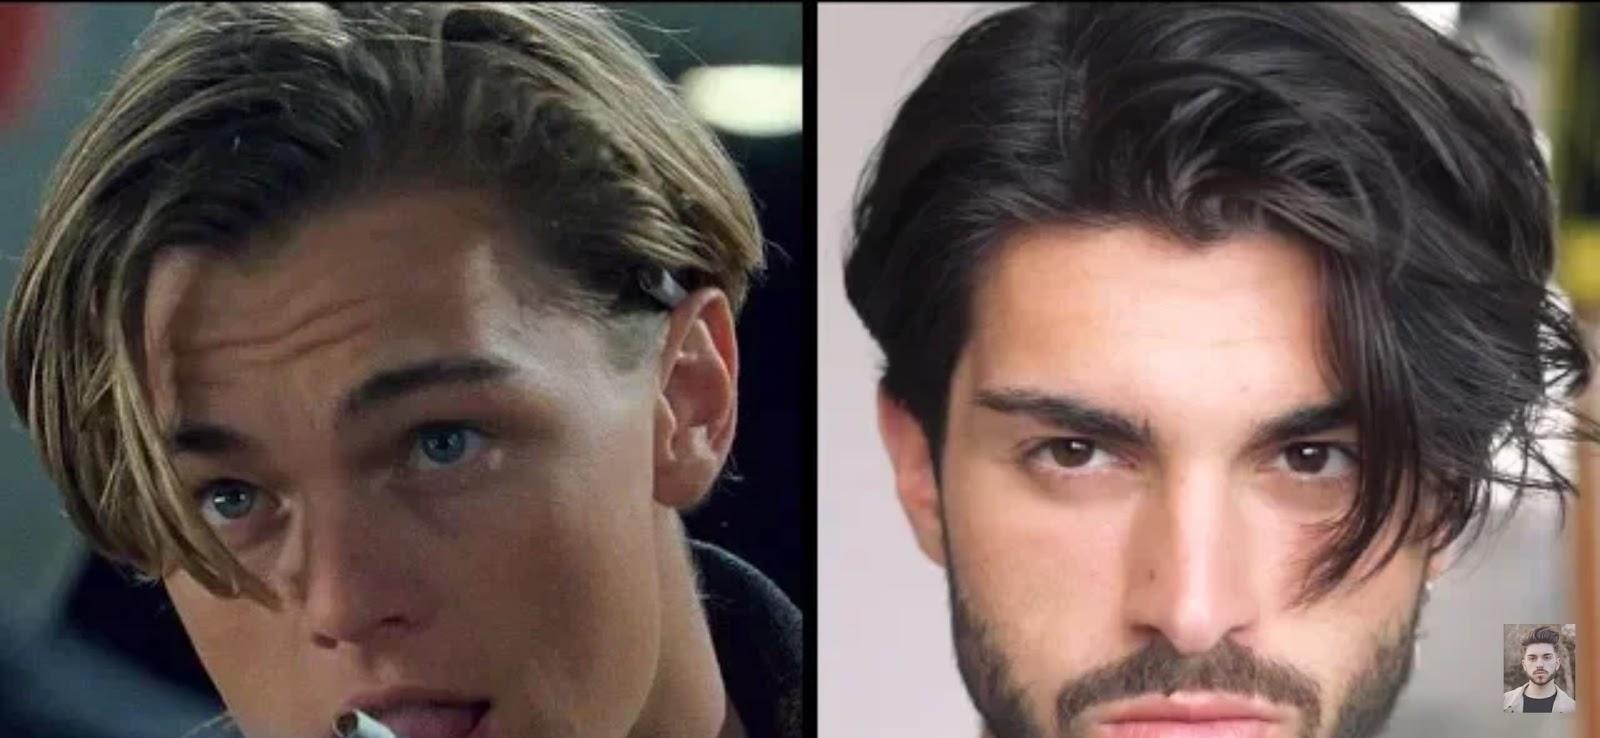 Stylish Hairstyles: Leonardo DiCaprio Inspired Hairstyle 5s